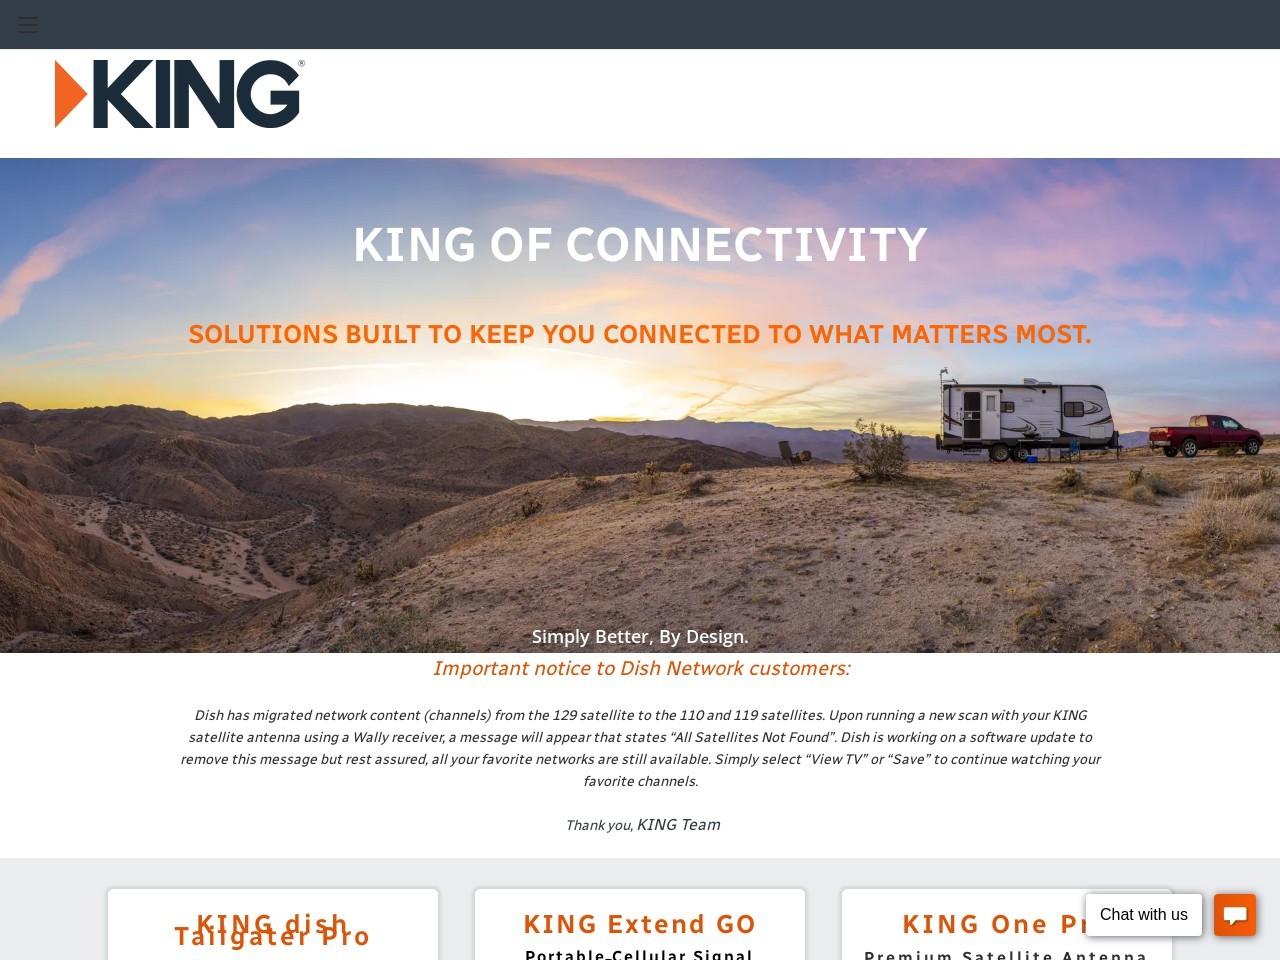 kingconnect.com